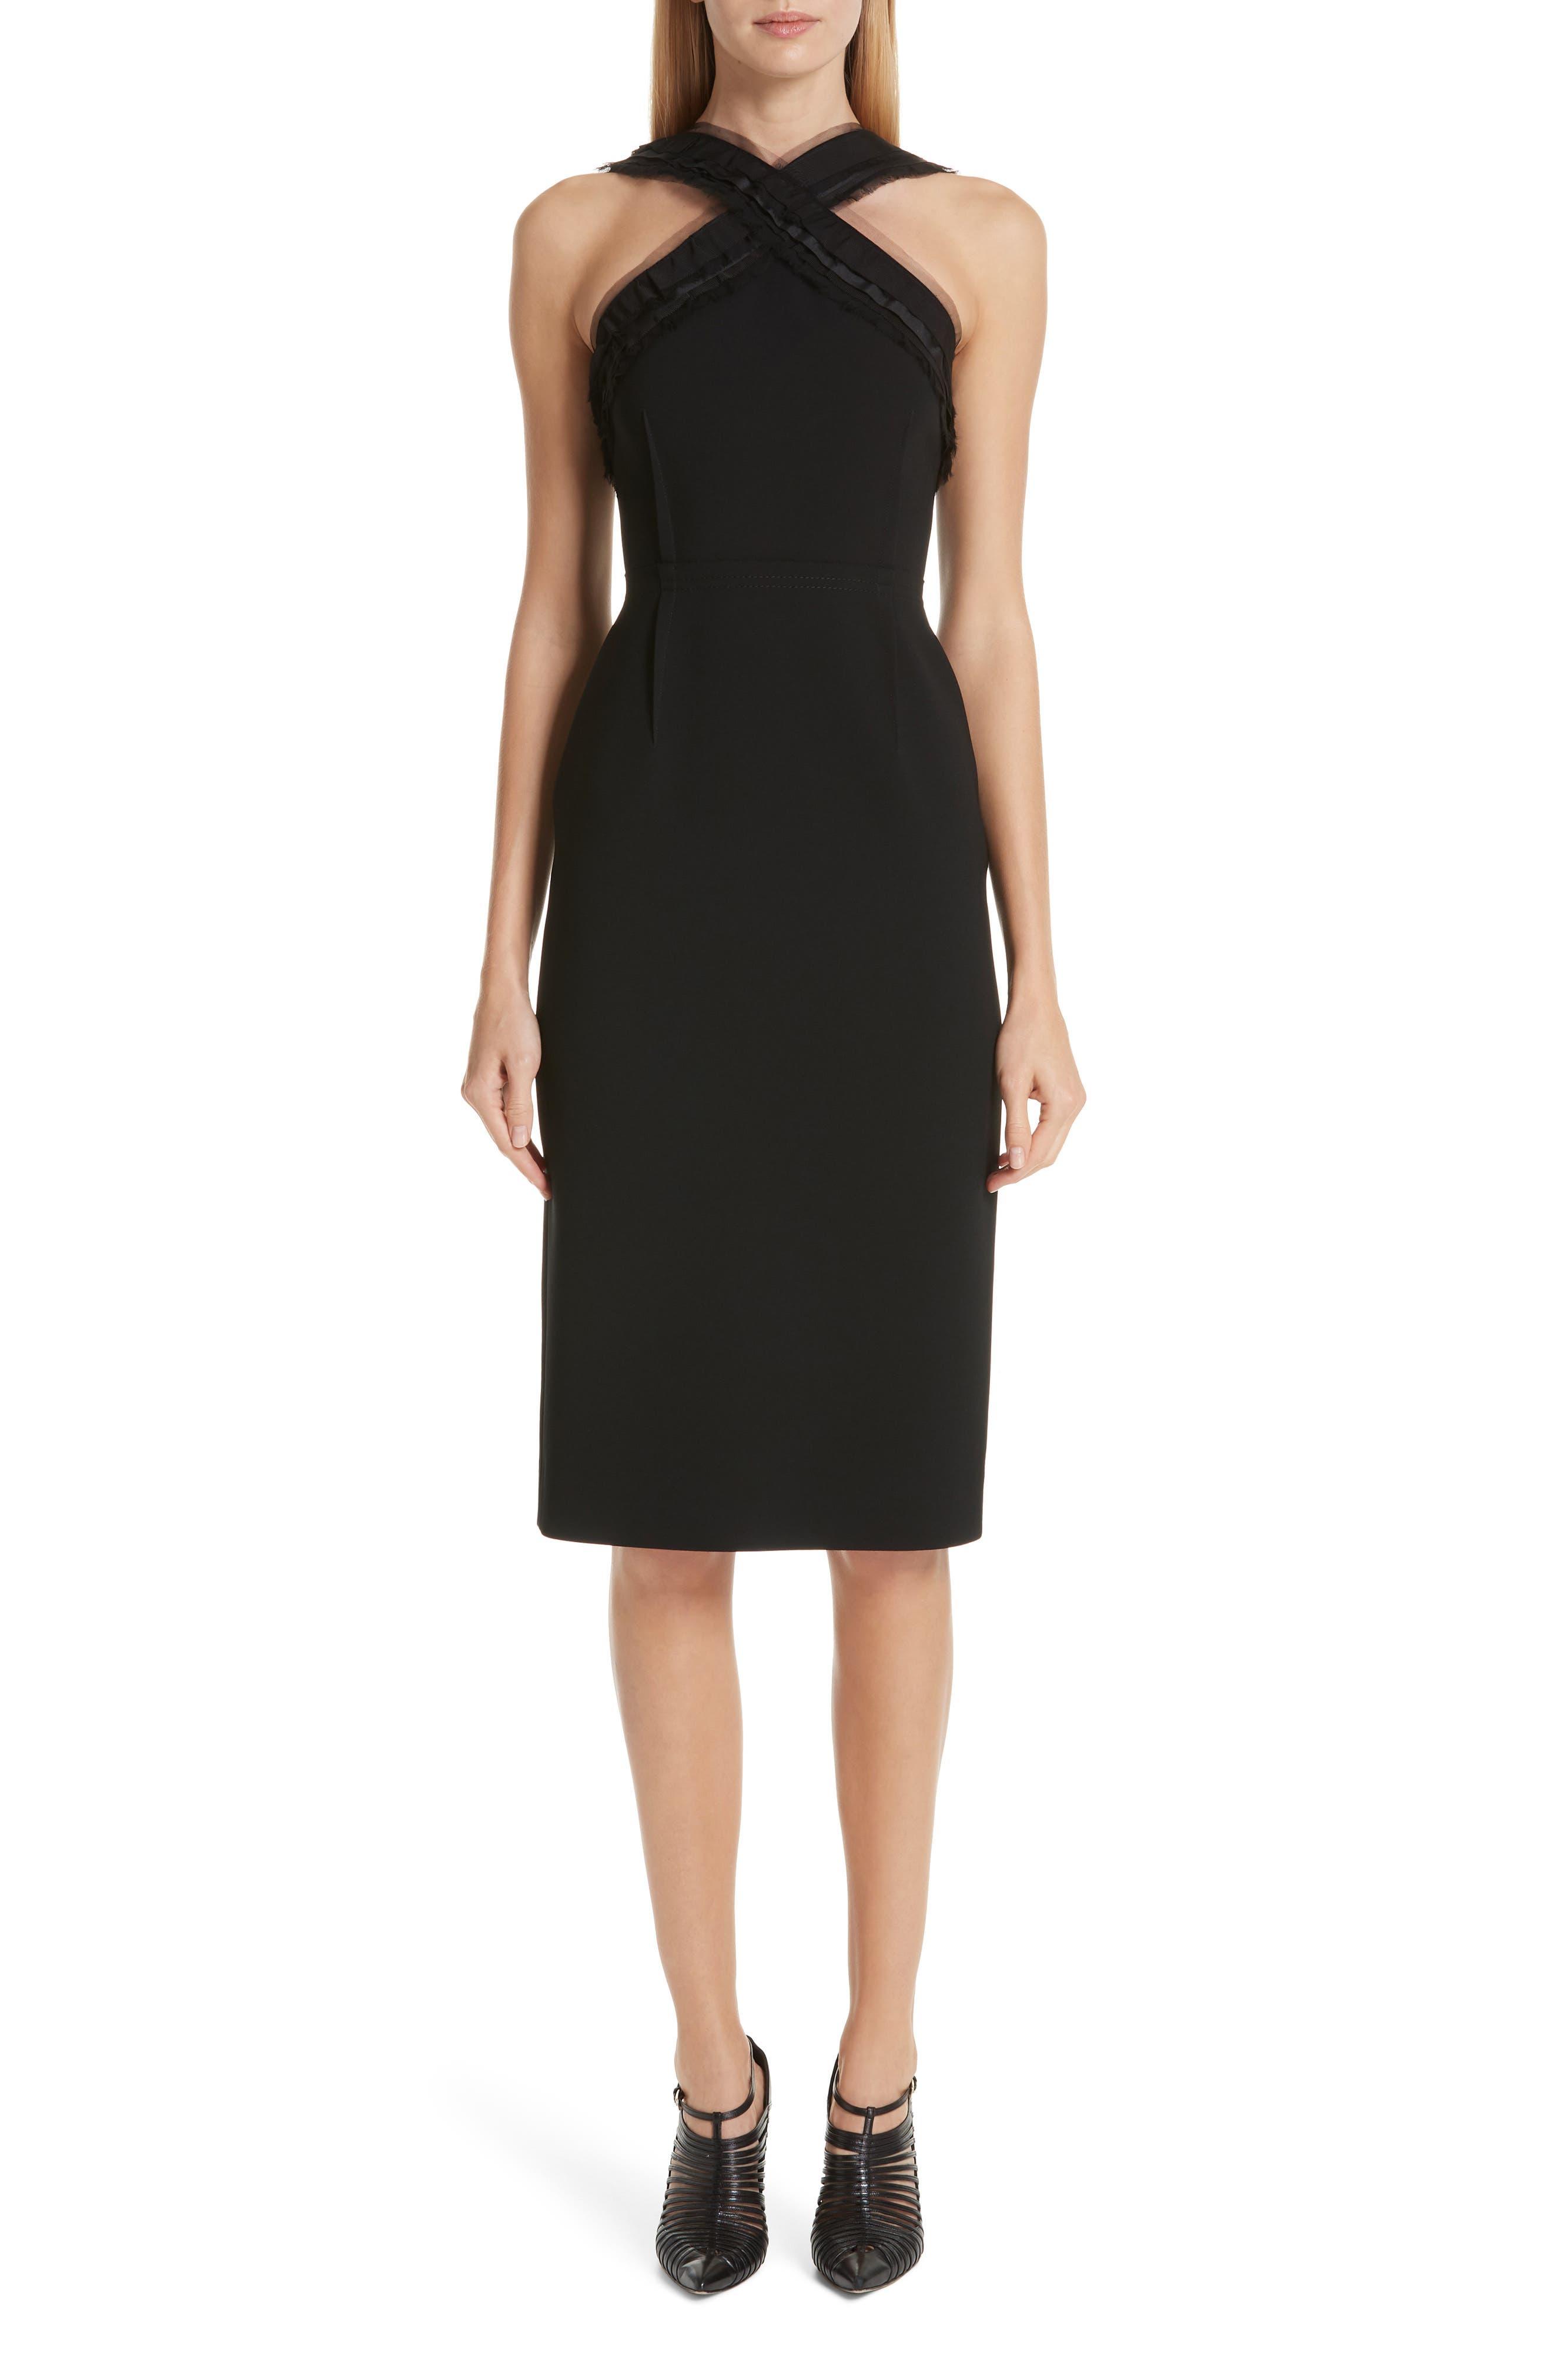 Jason Wu Collection Compact Crepe Ruffle Trim Dress, Black